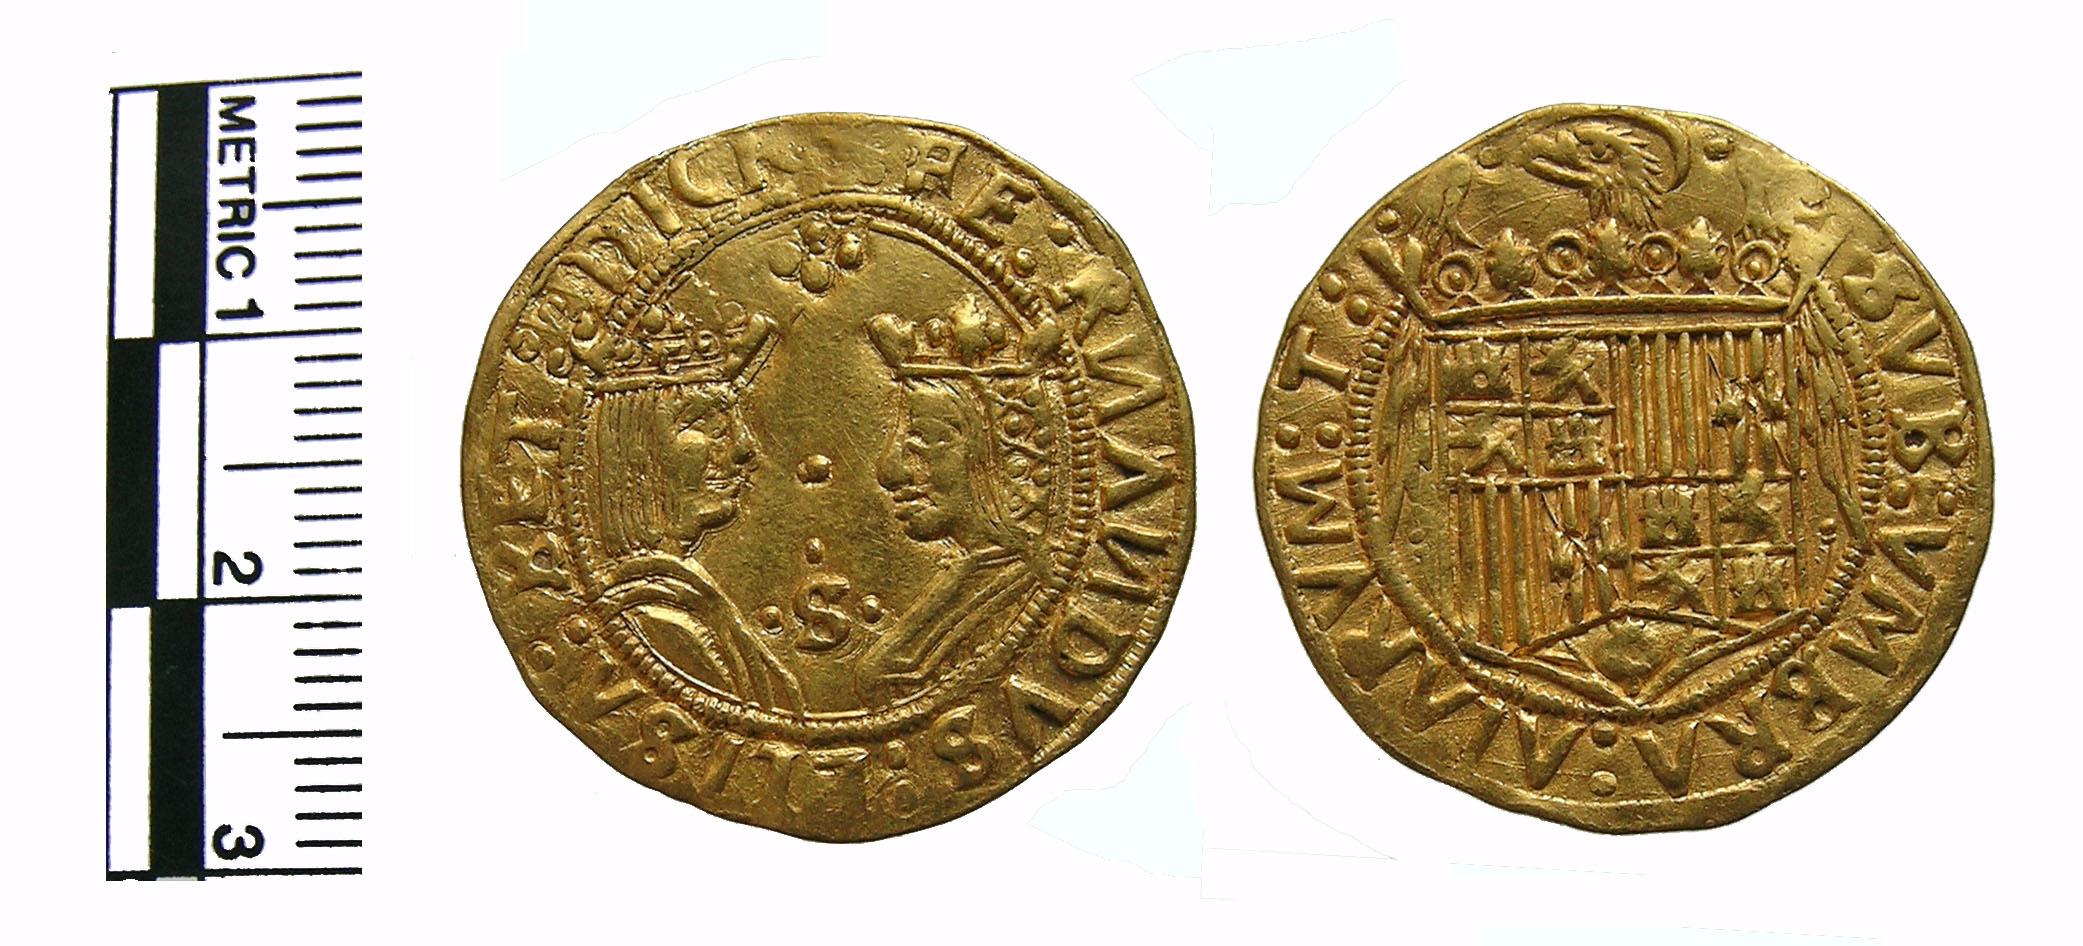 Spanish Coin Found On Oak Island